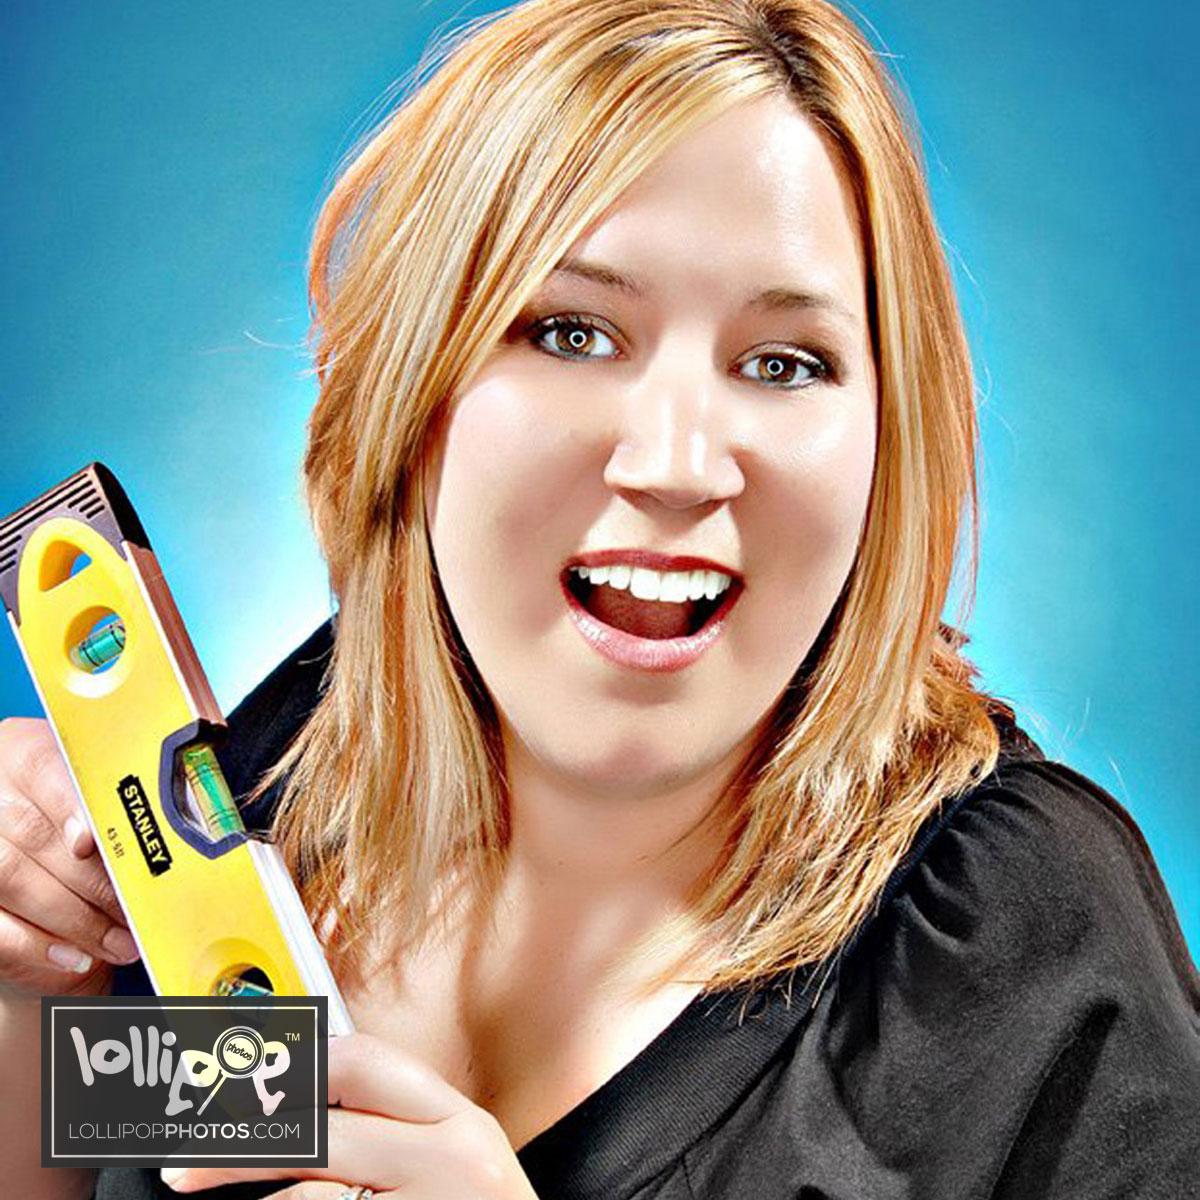 msdig-nora-canfield-lollipop-photos-107.jpg